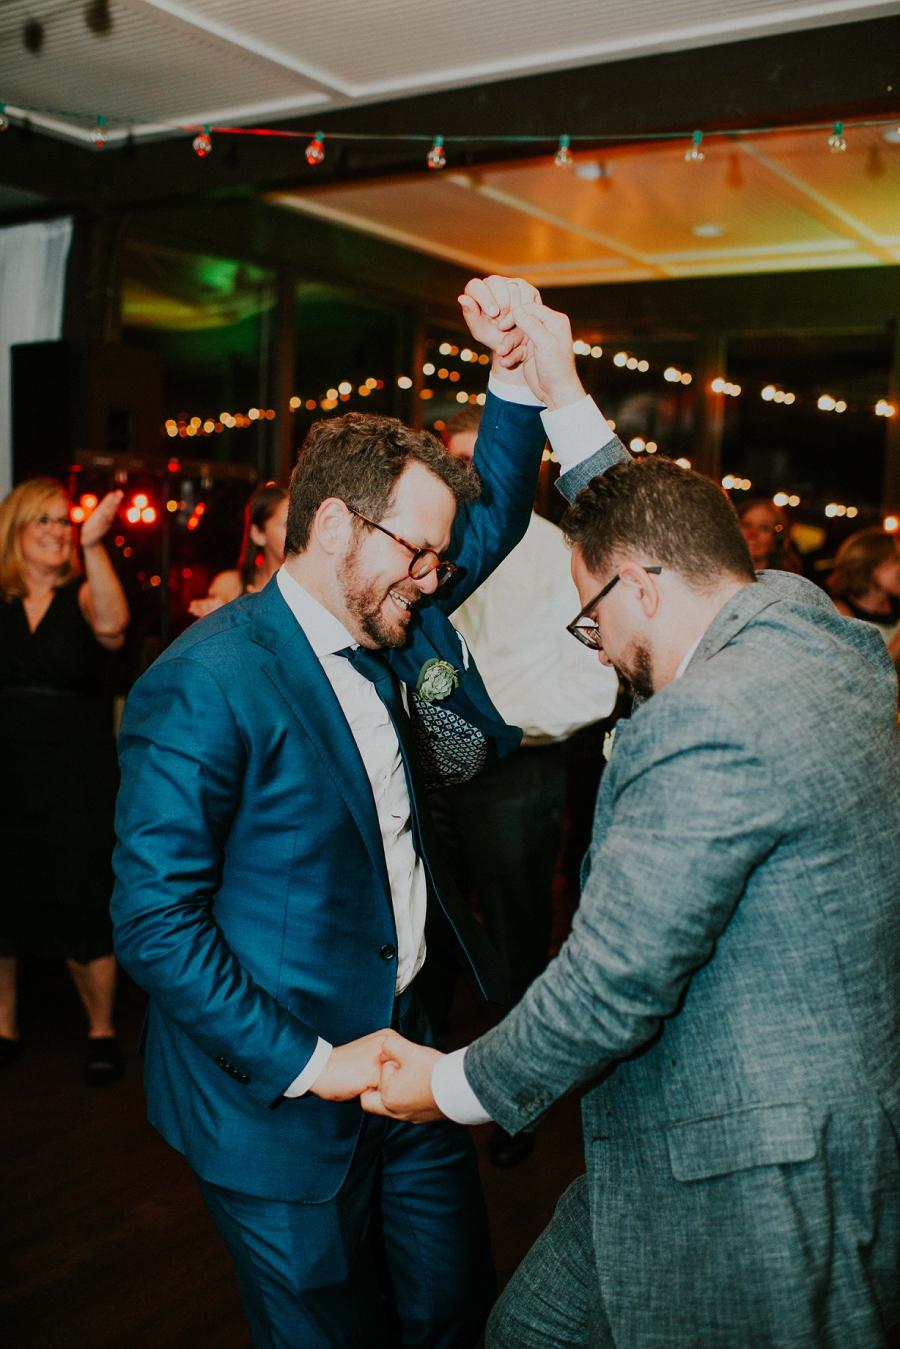 HillbrookClub_Wedding_Cleveland_Jessica+Dani_M+JPhoto-1043.JPG